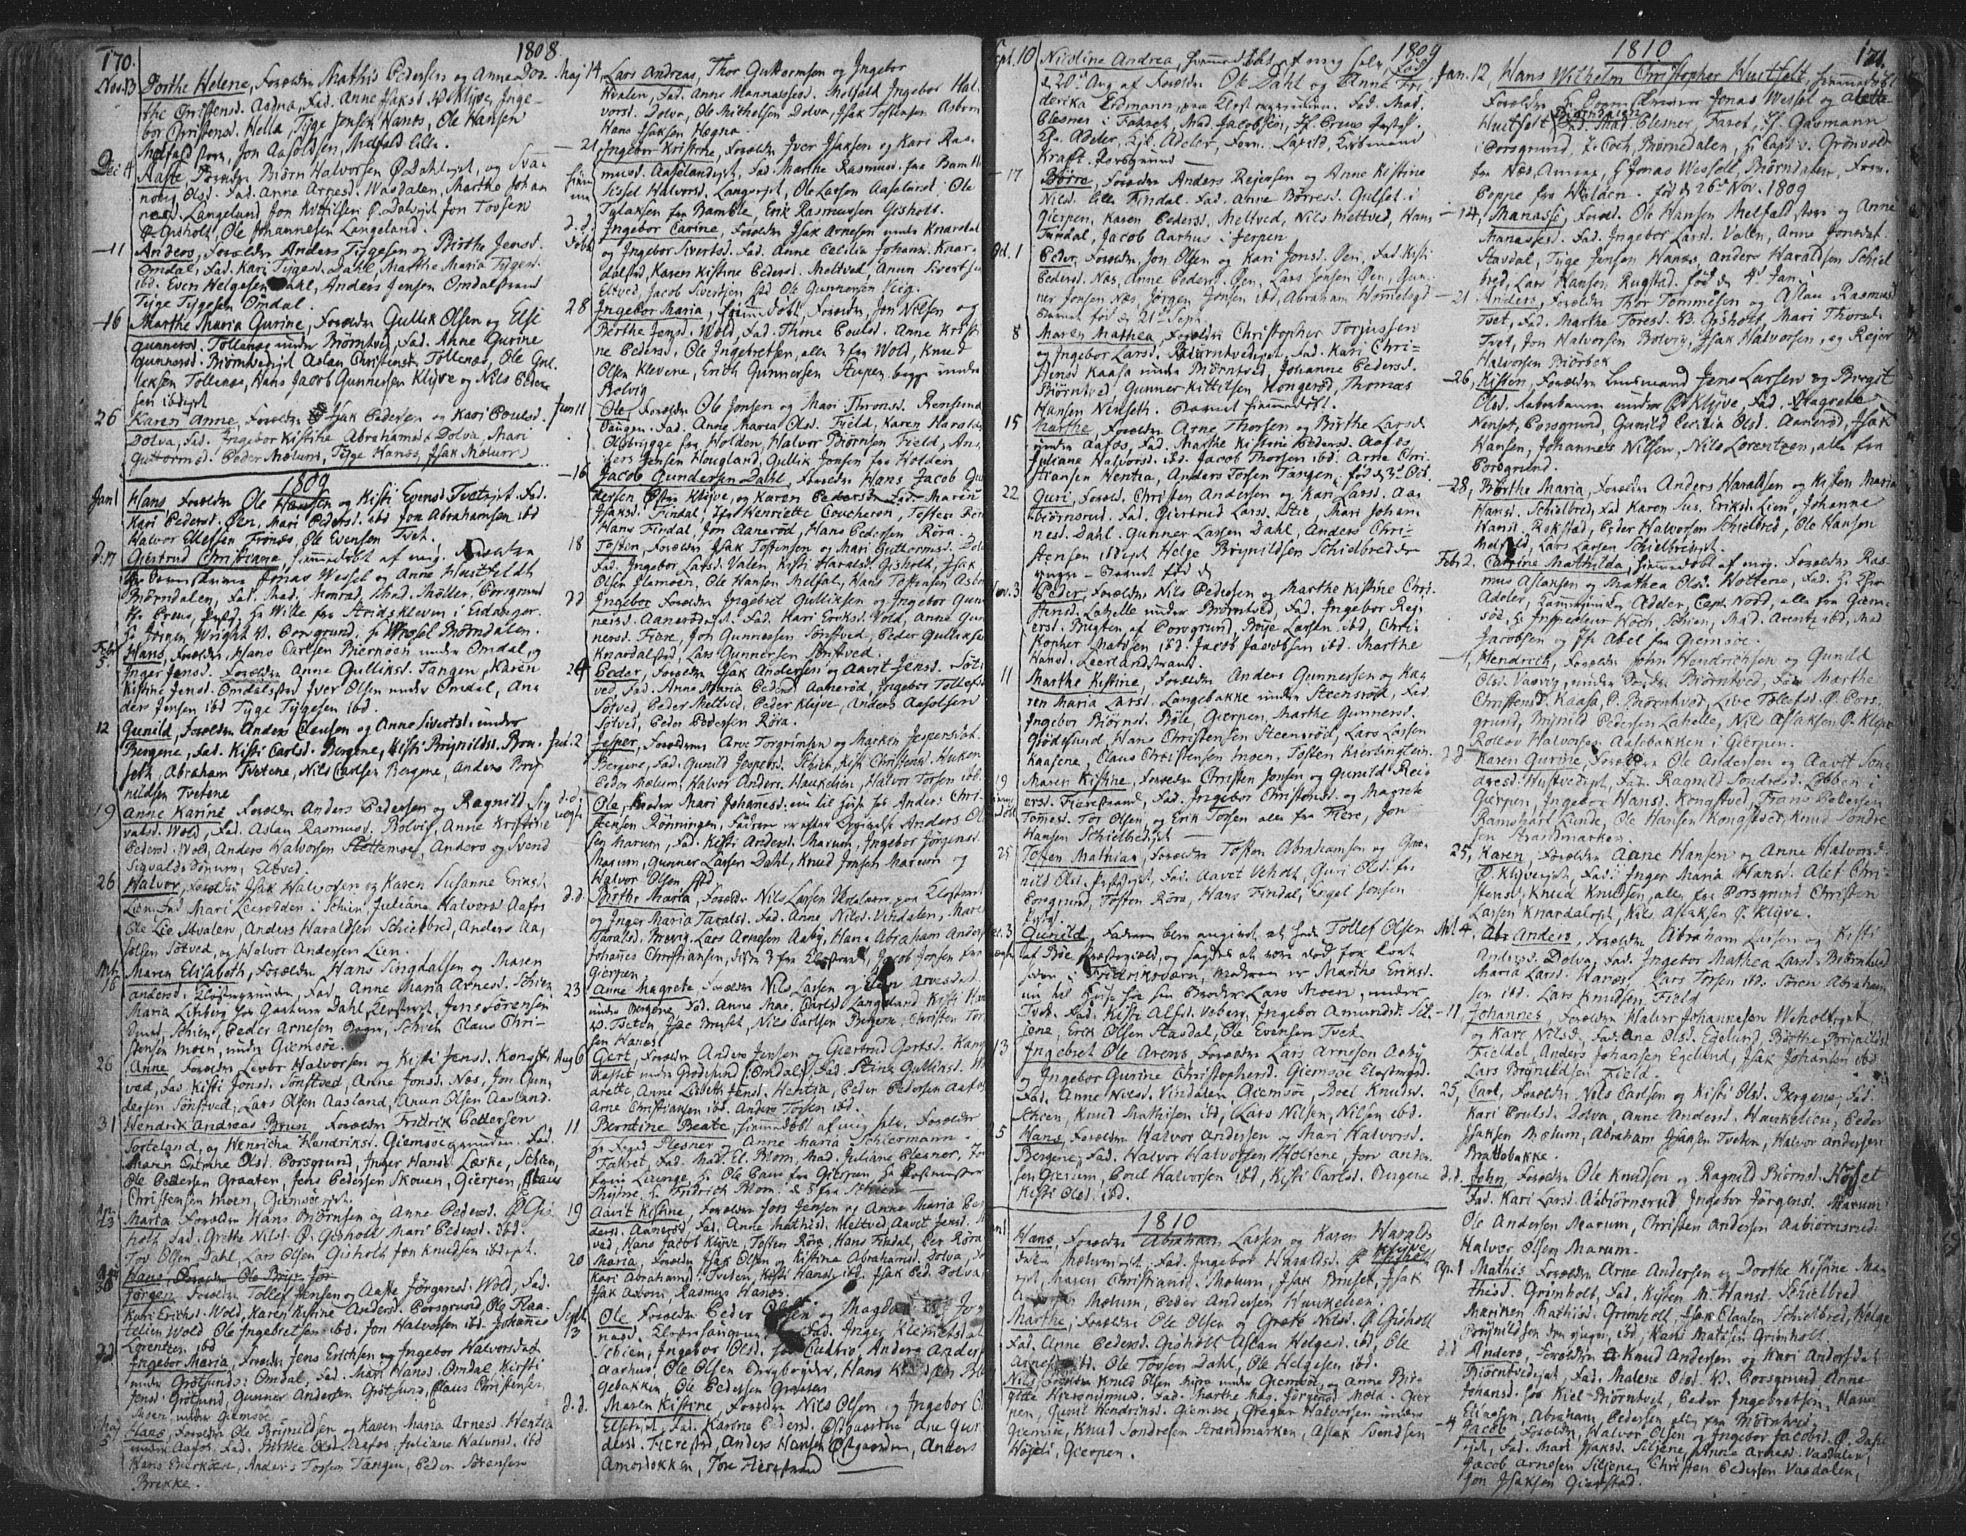 SAKO, Solum kirkebøker, F/Fa/L0003: Ministerialbok nr. I 3, 1761-1814, s. 170-171